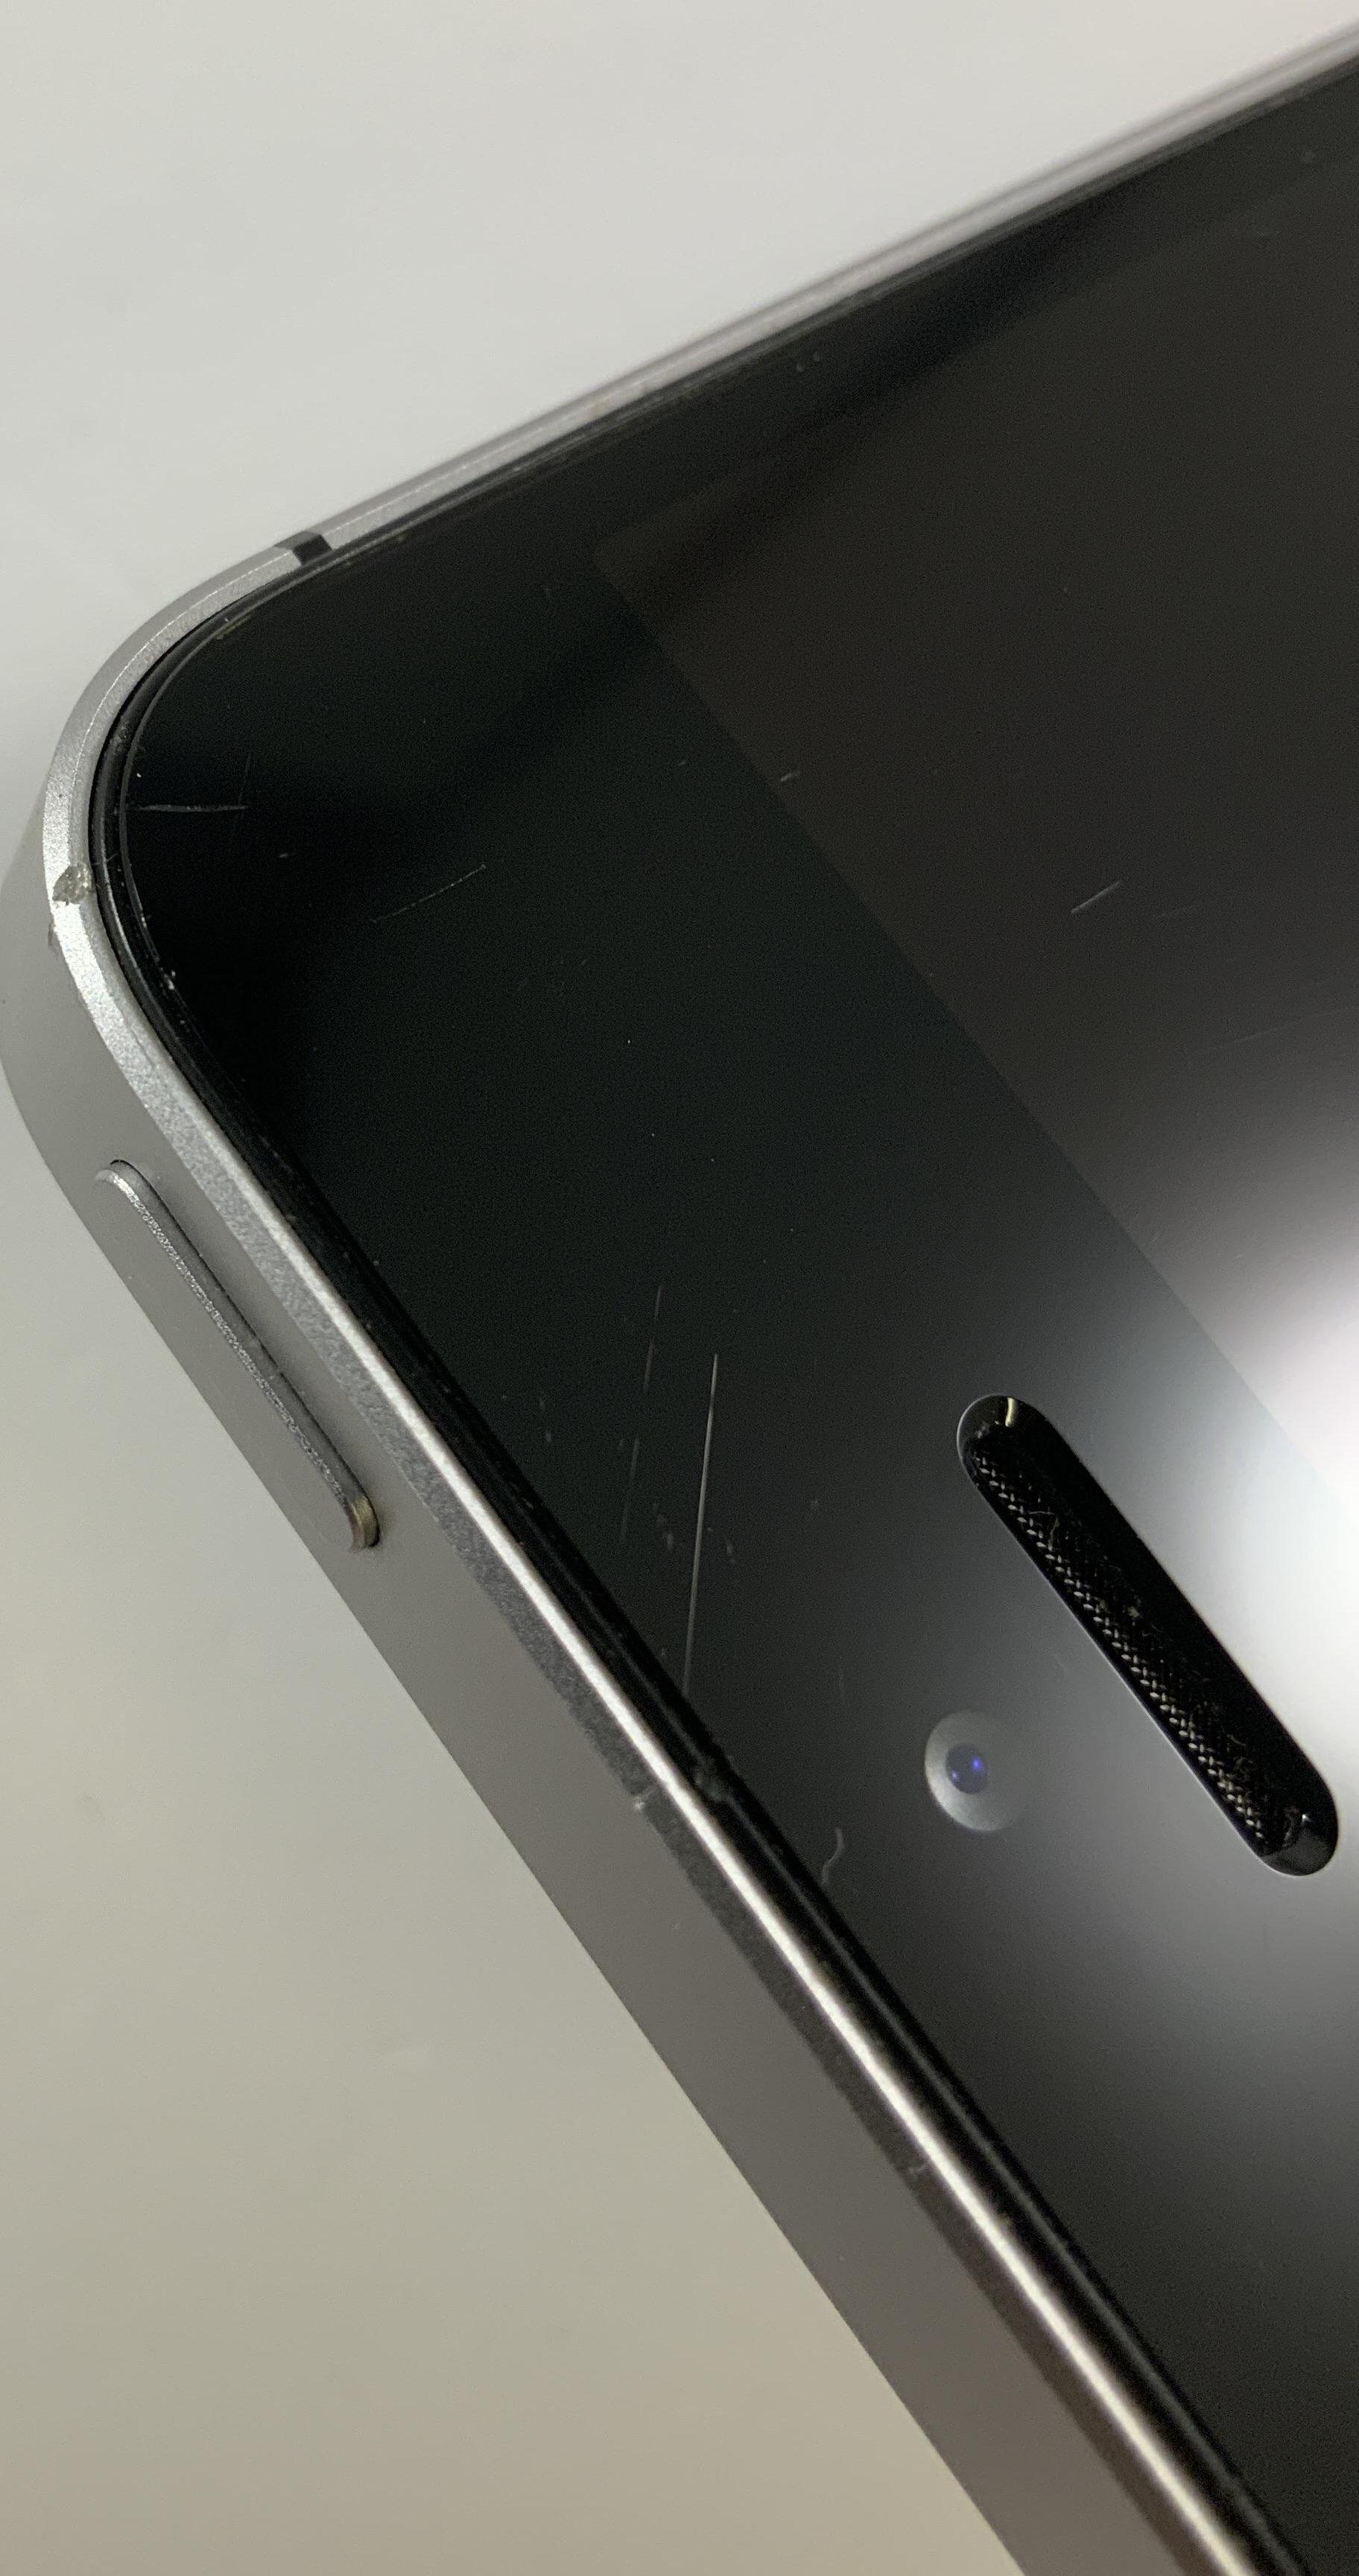 iPhone SE 32GB, 32GB, Space Gray, image 4